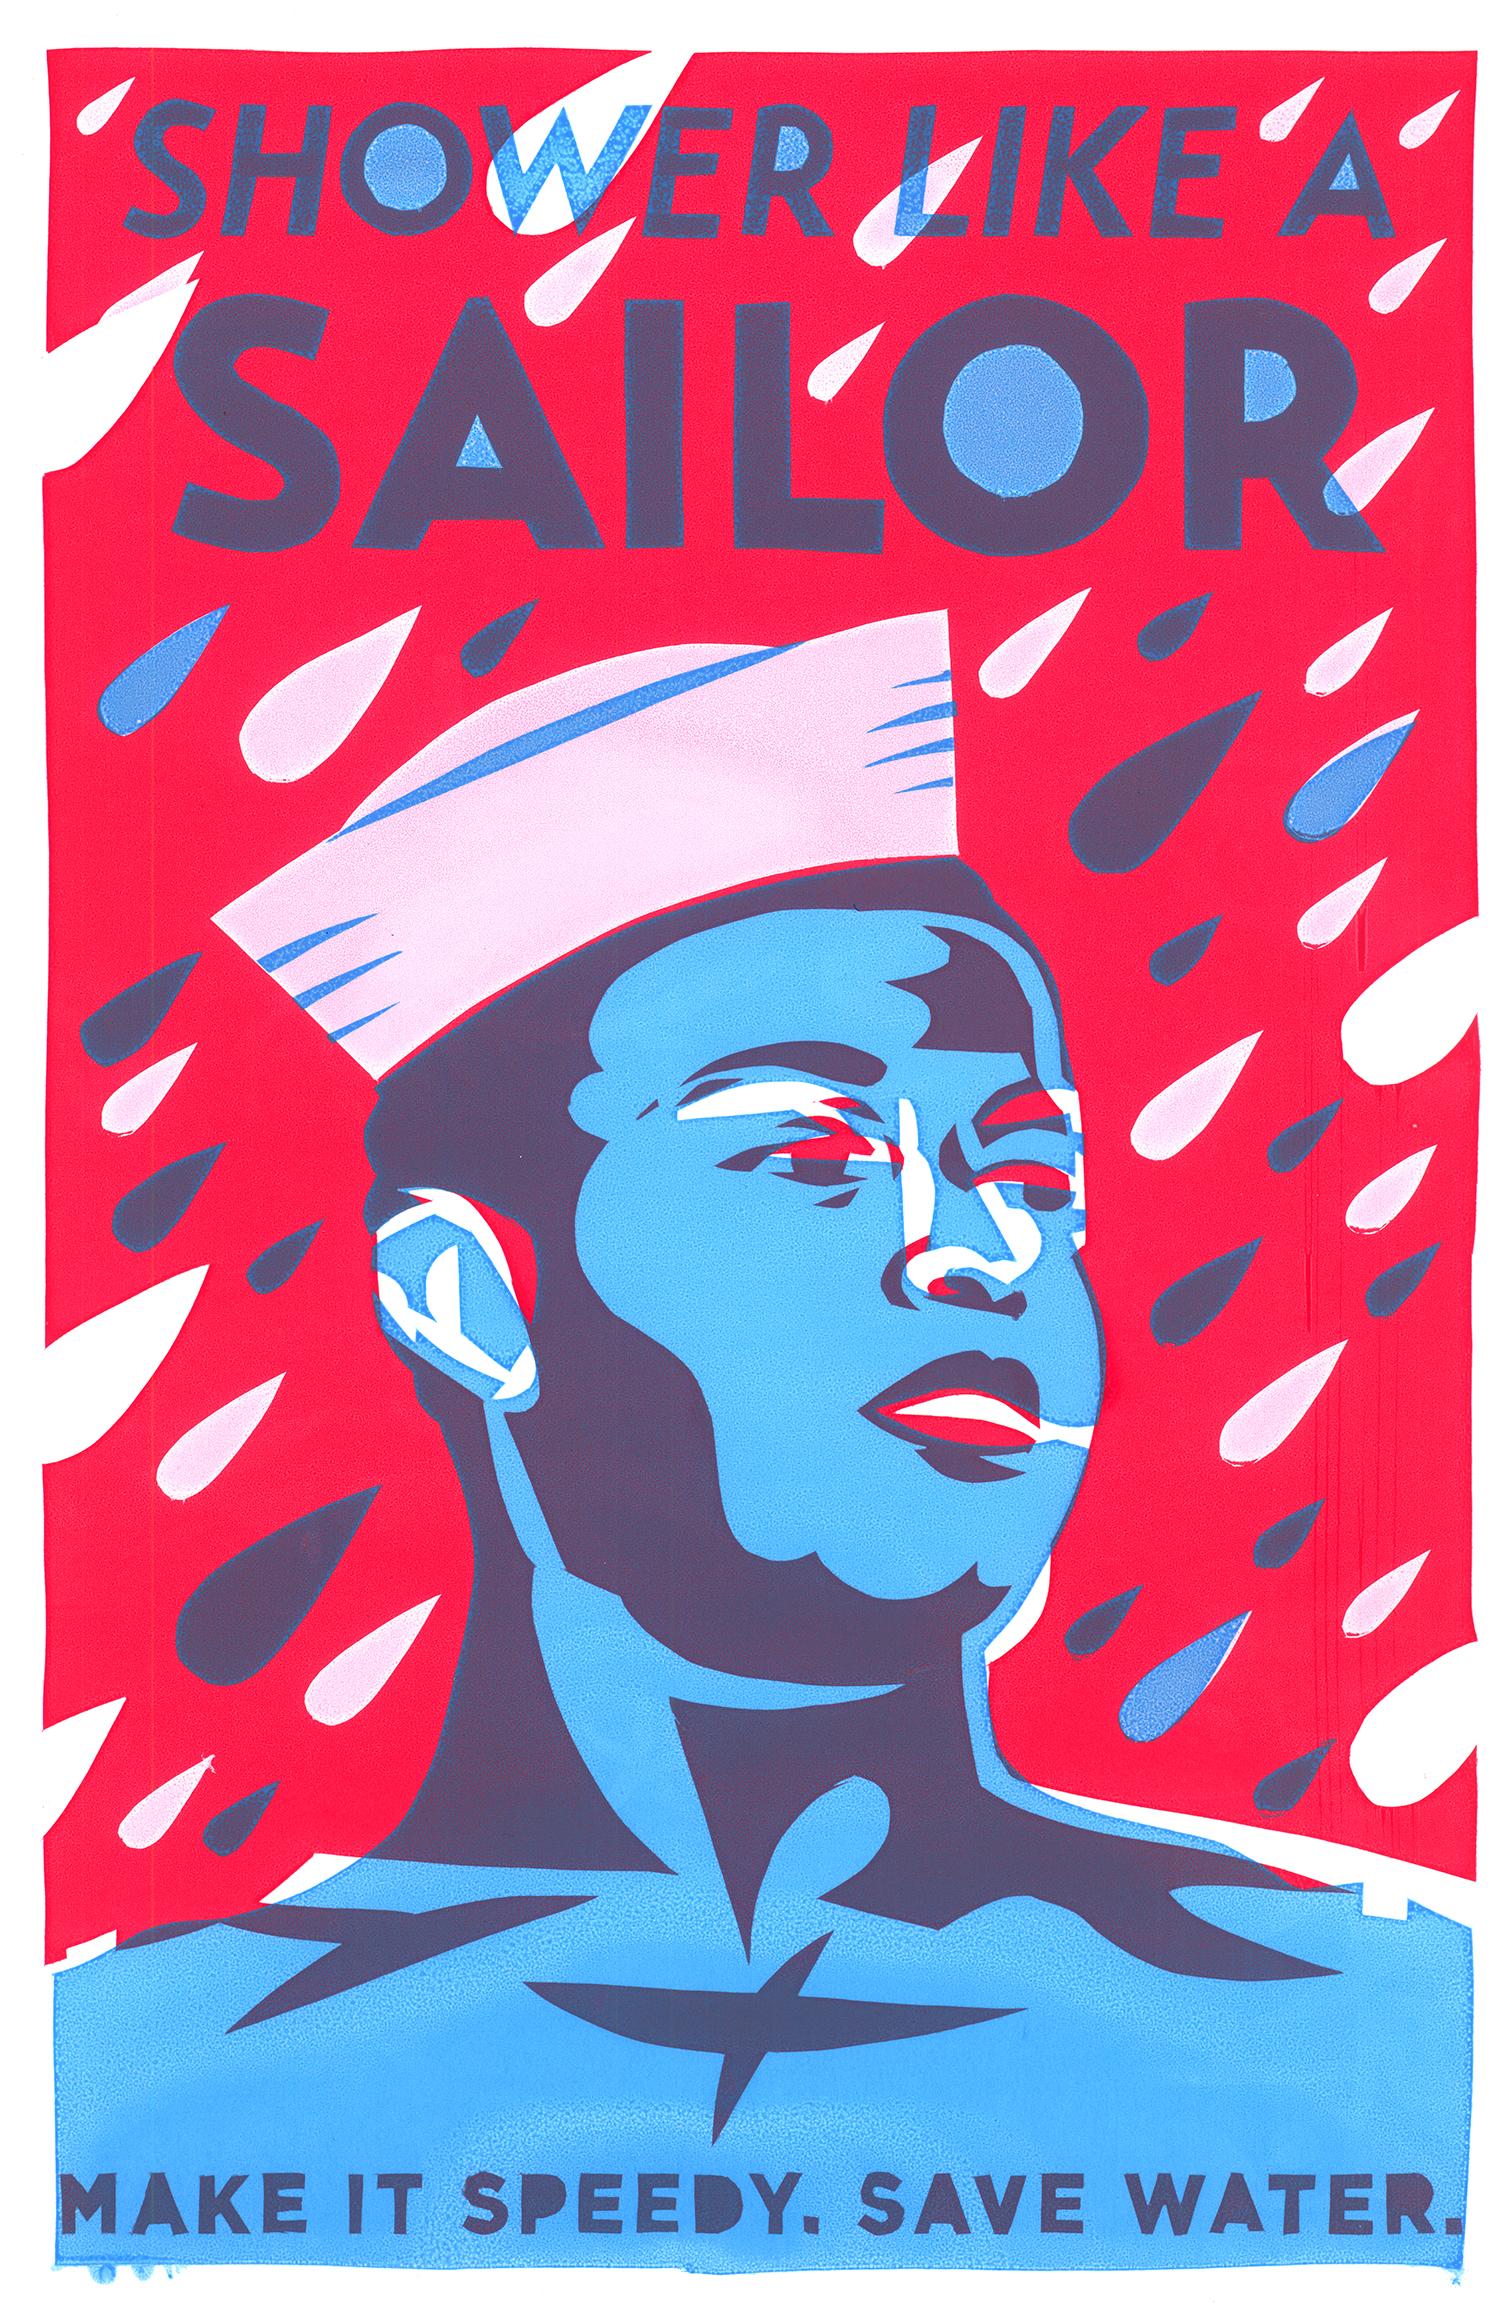 Shower Like A Sailor